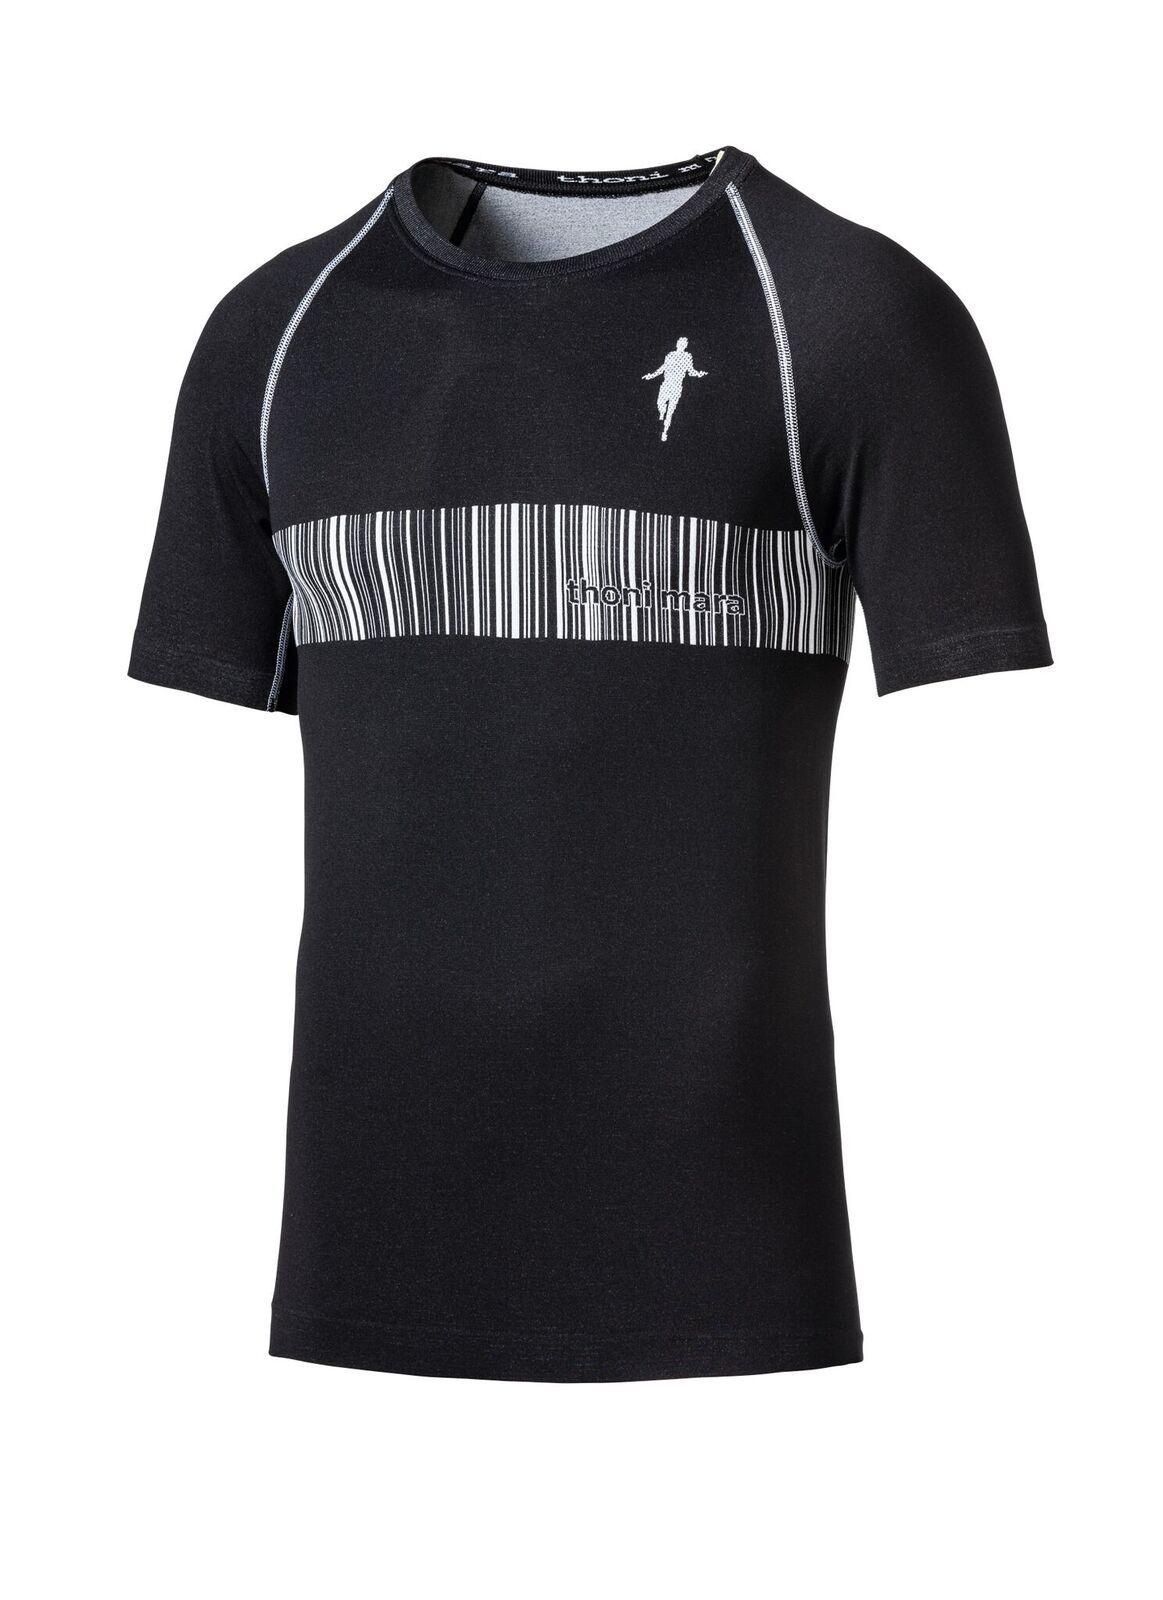 Thonimara Ti Shirt EAN (Schwarz)